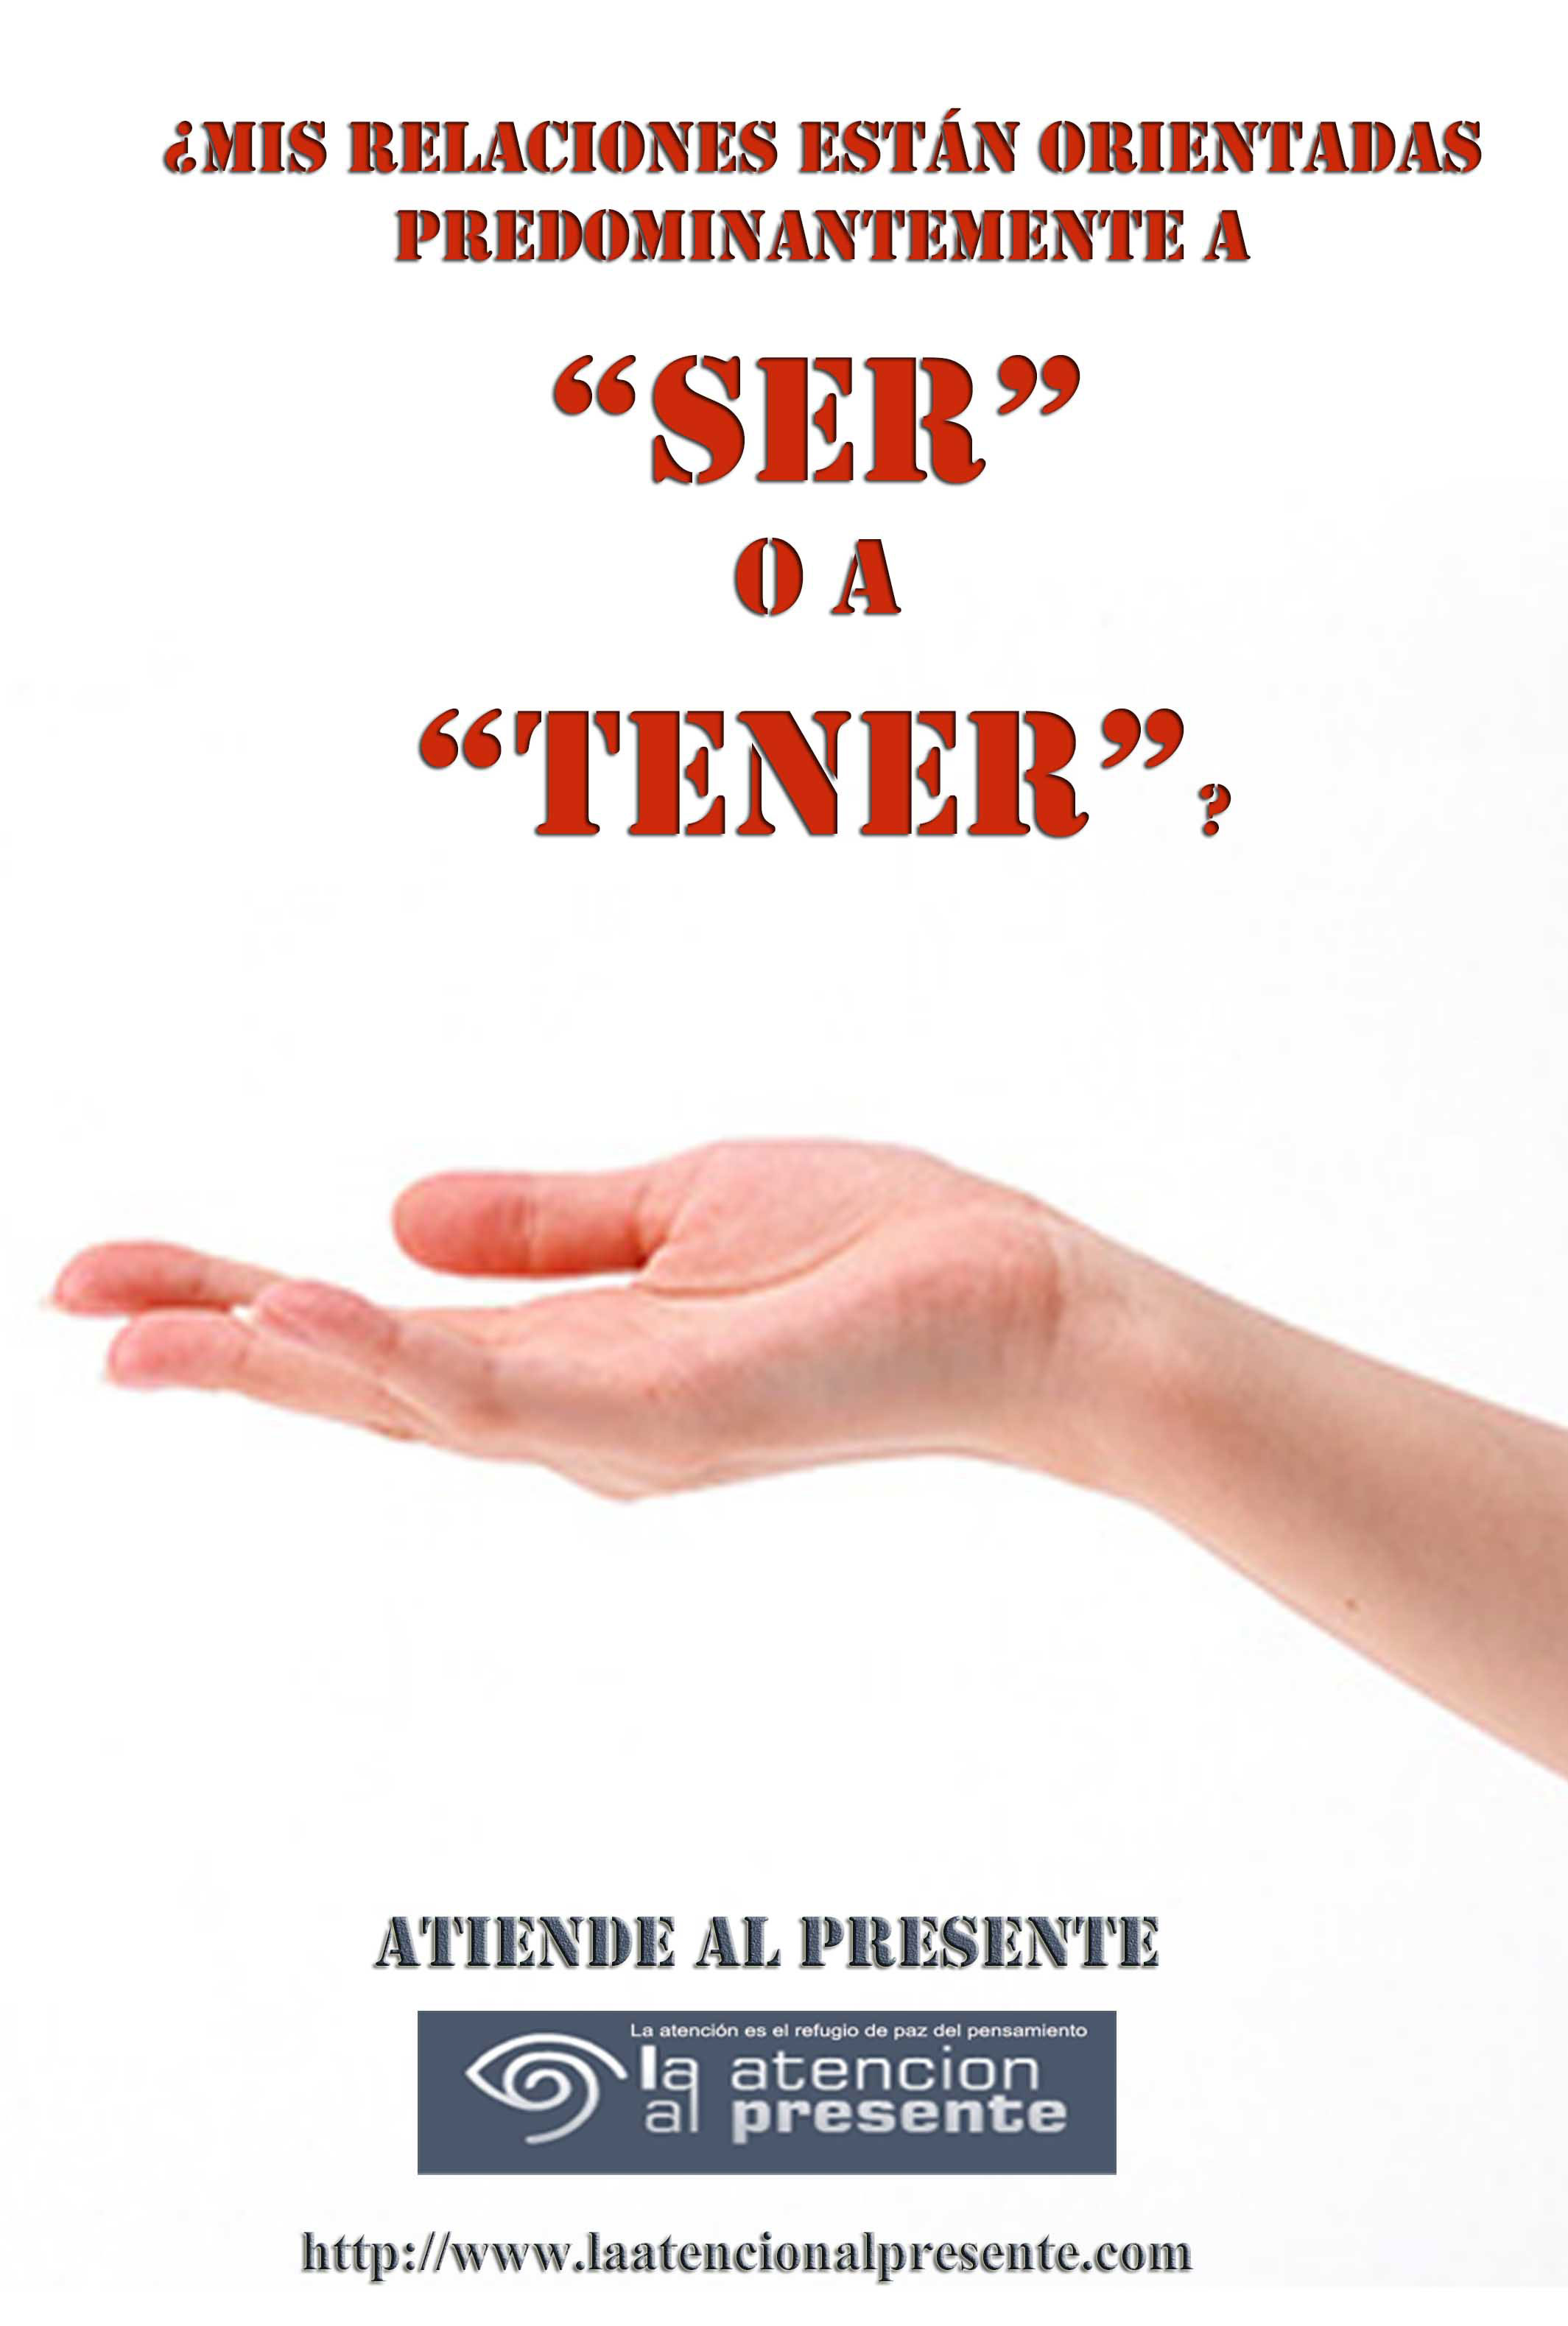 12 de marzo Pepe Mis relaciones están orientadas predominantemente a SER o a TENER. MENOS PESO